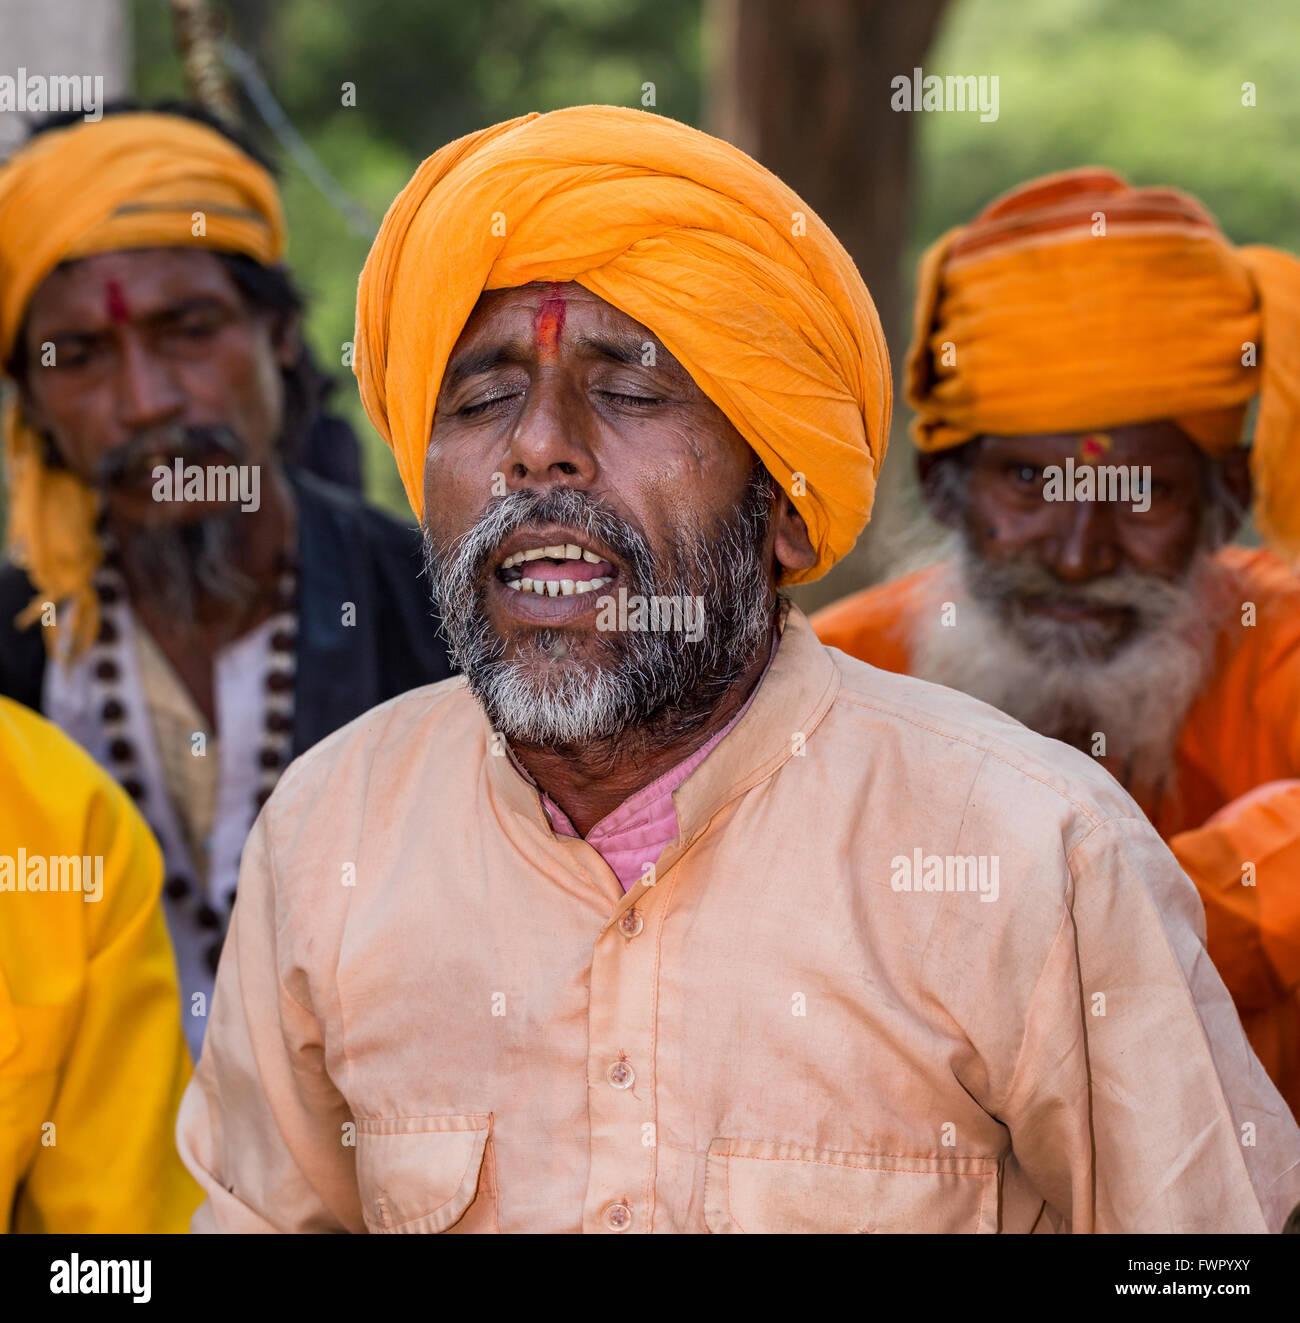 A sadhu singing, Pushkar, Rajasthan, India - Stock Image